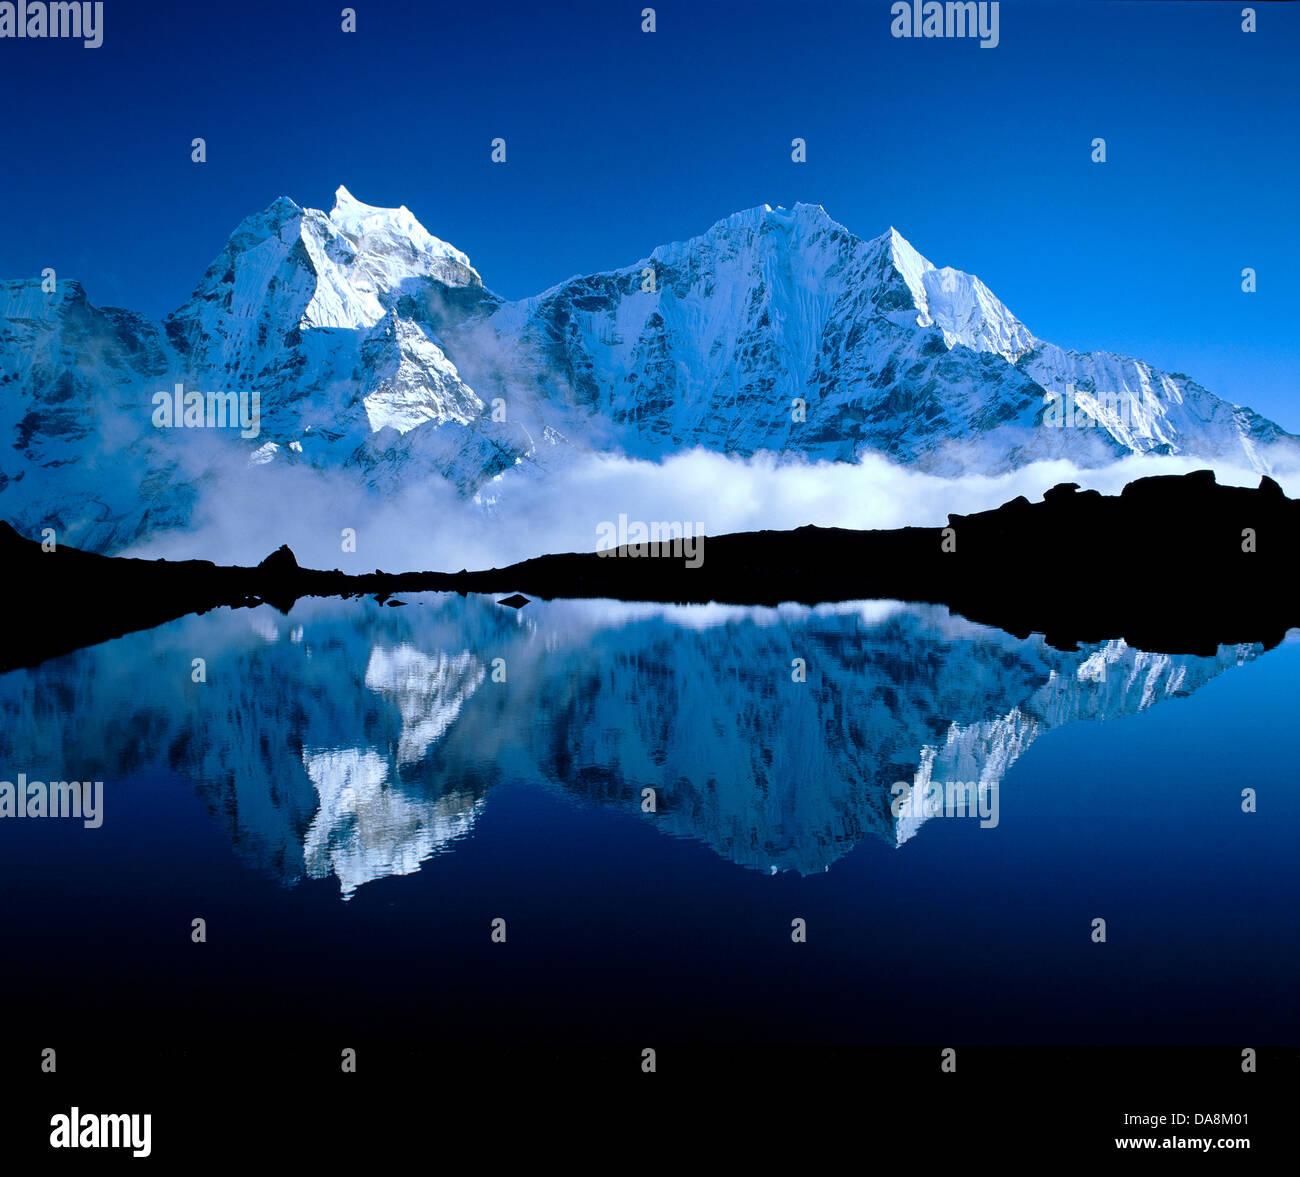 Nepal, Solo Khumbu, Khumbu Himalaya, Khumbu, mountain lake, lake, water, reflection, mountains, glaciers, ice, clouds, - Stock Image